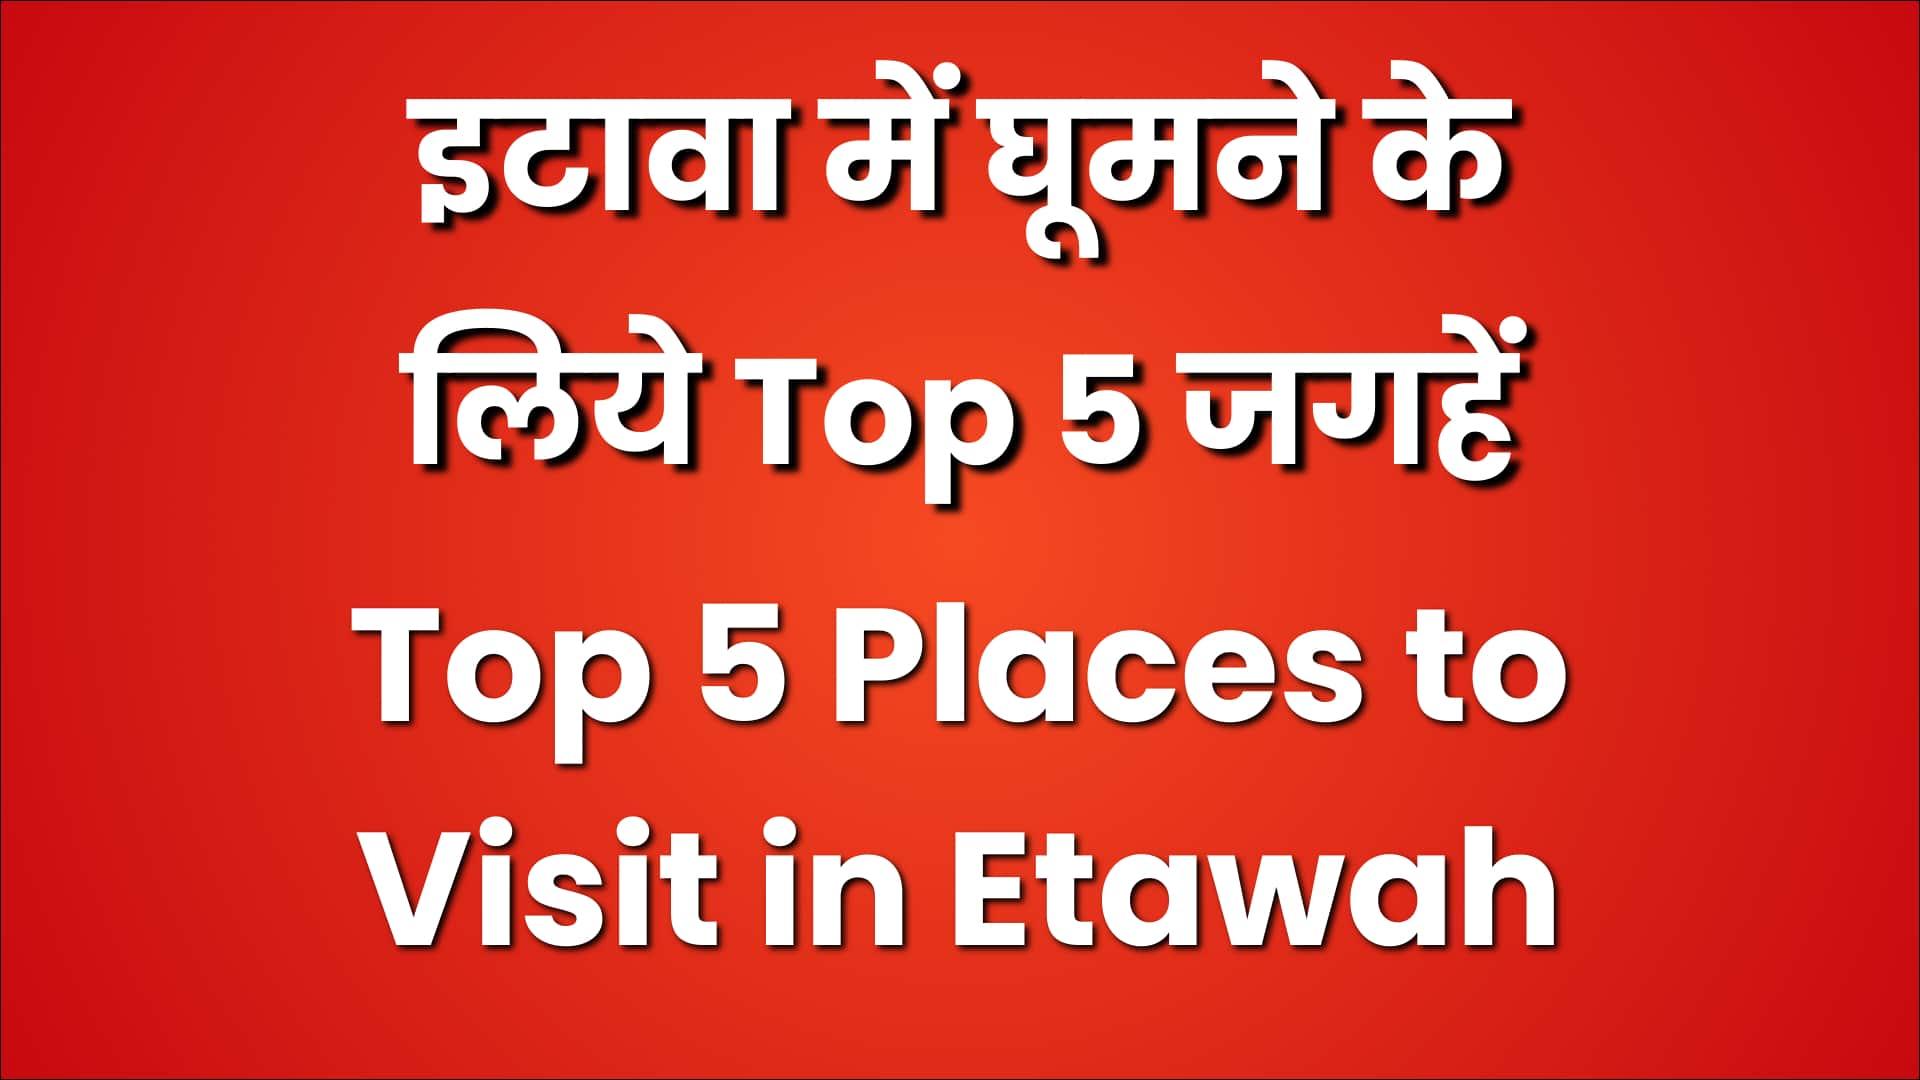 Top 5 placses to visit in etawah